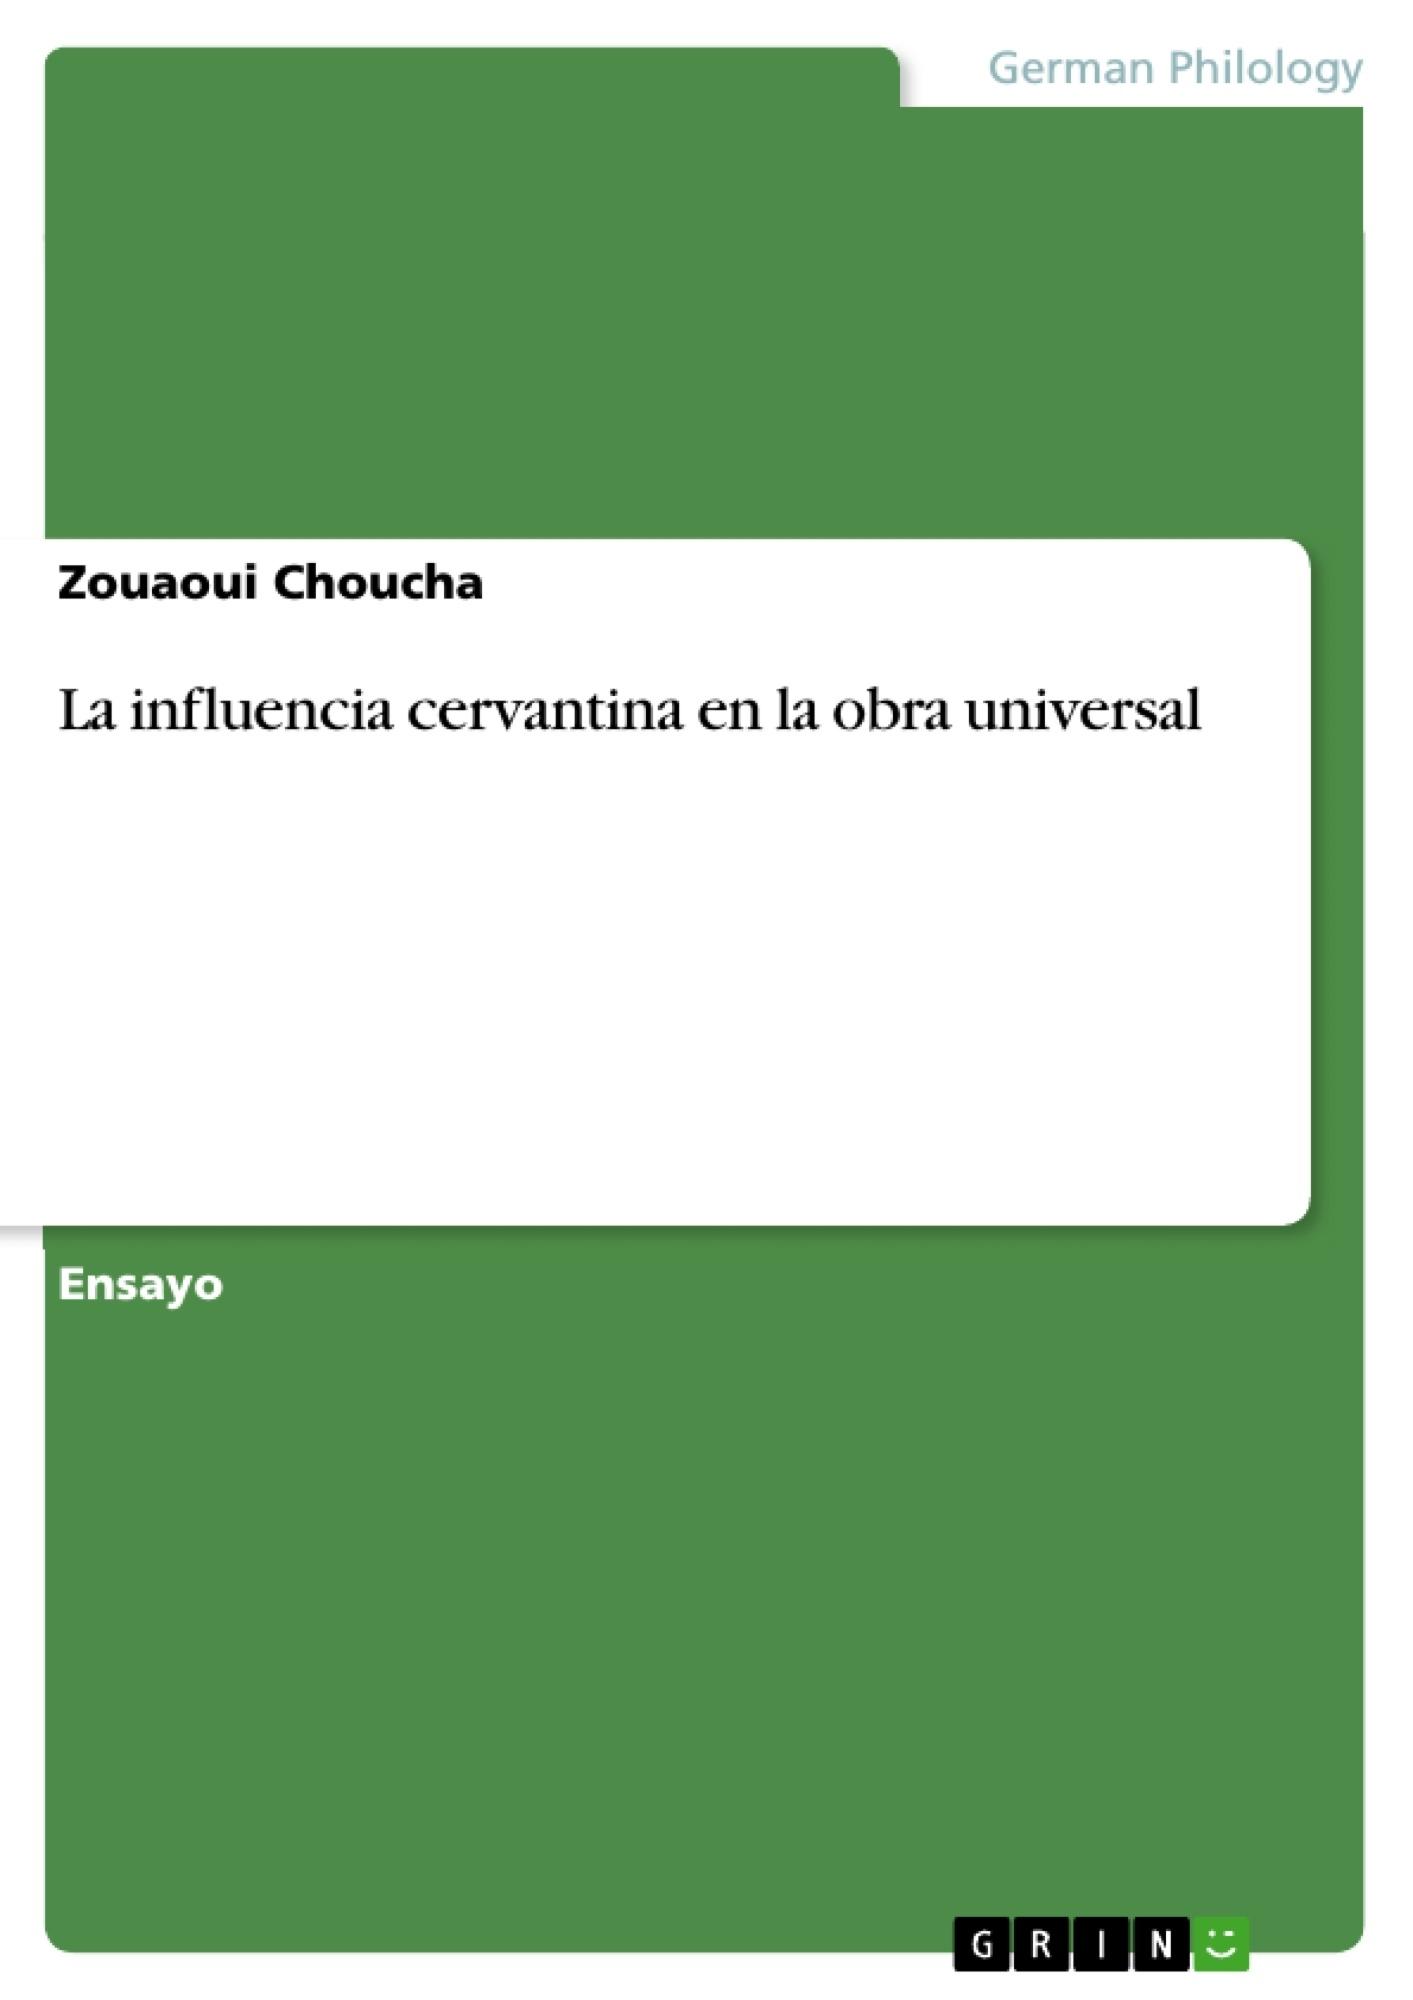 Título: La influencia cervantina en la obra universal